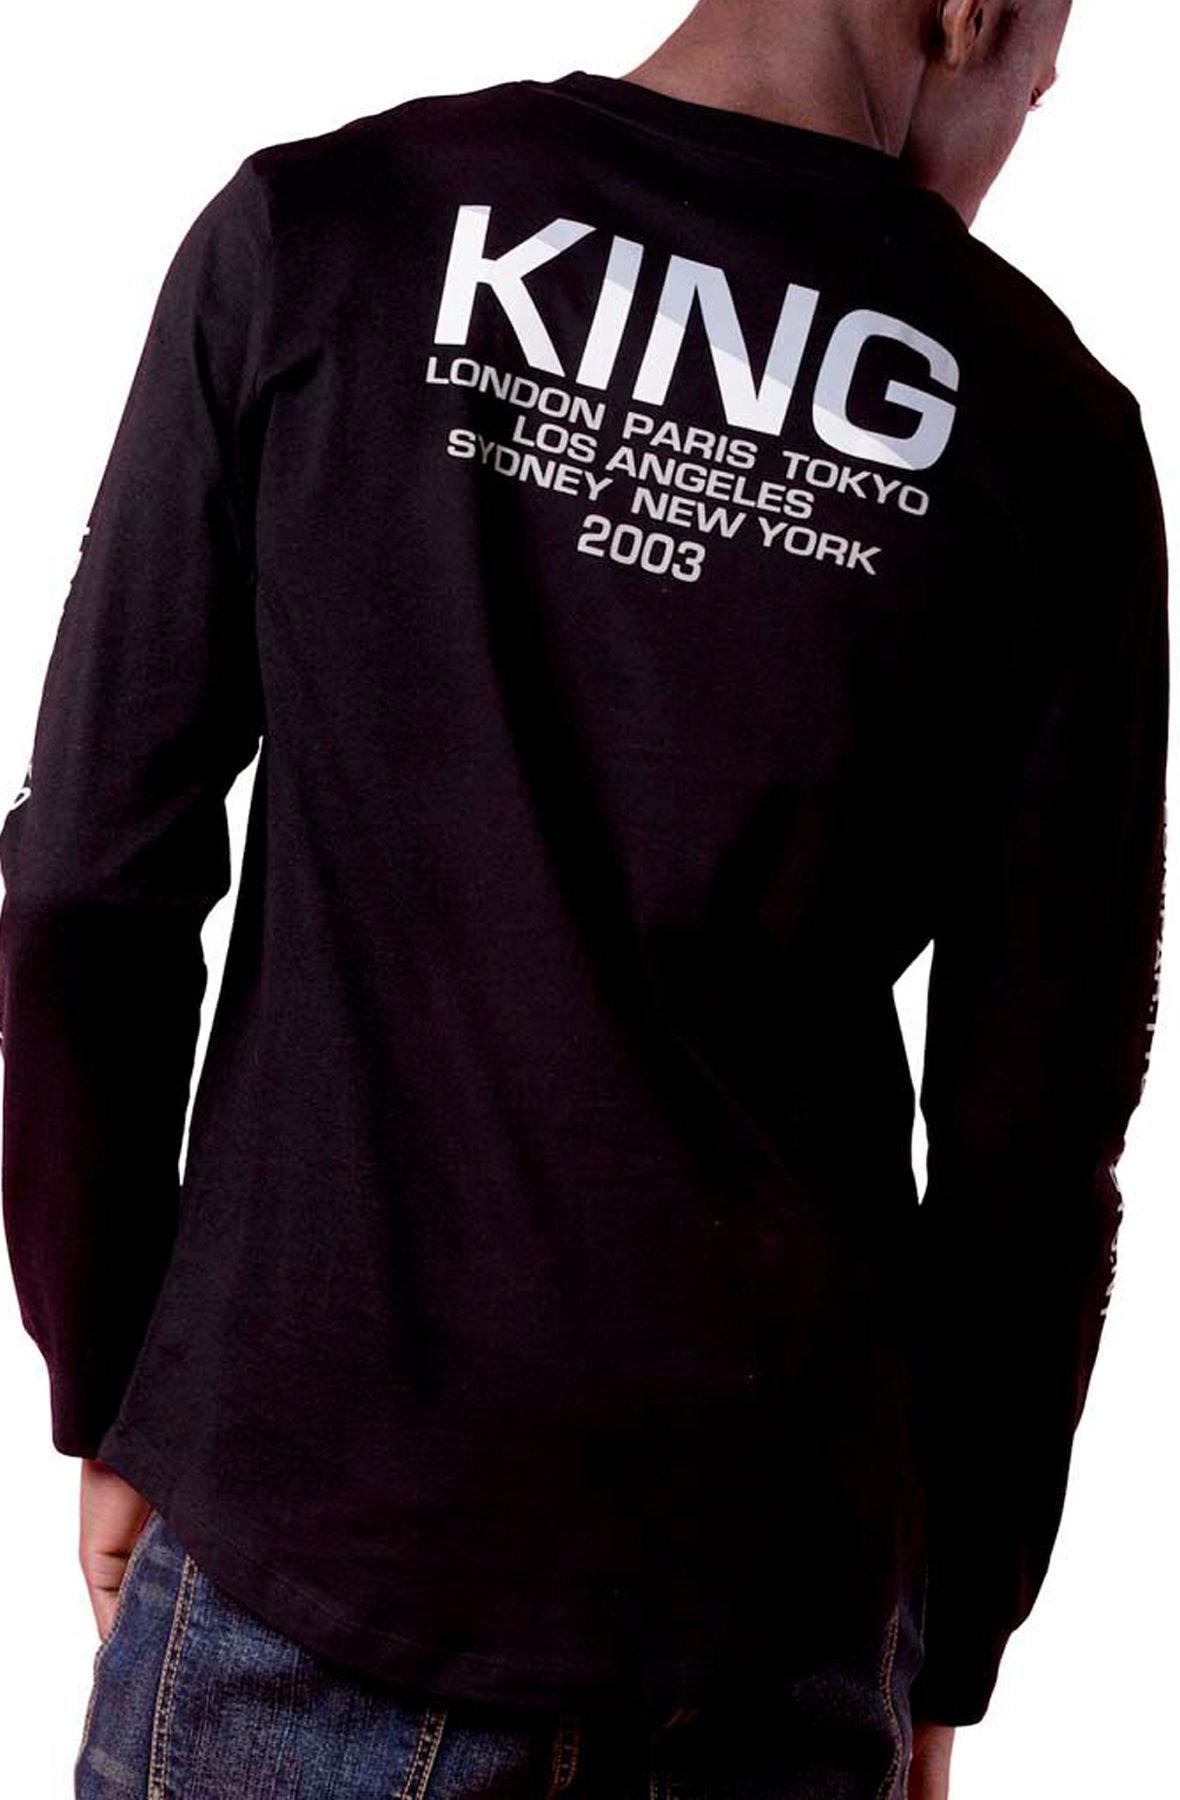 Image of Homerton Longsleeve T-Shirt Black